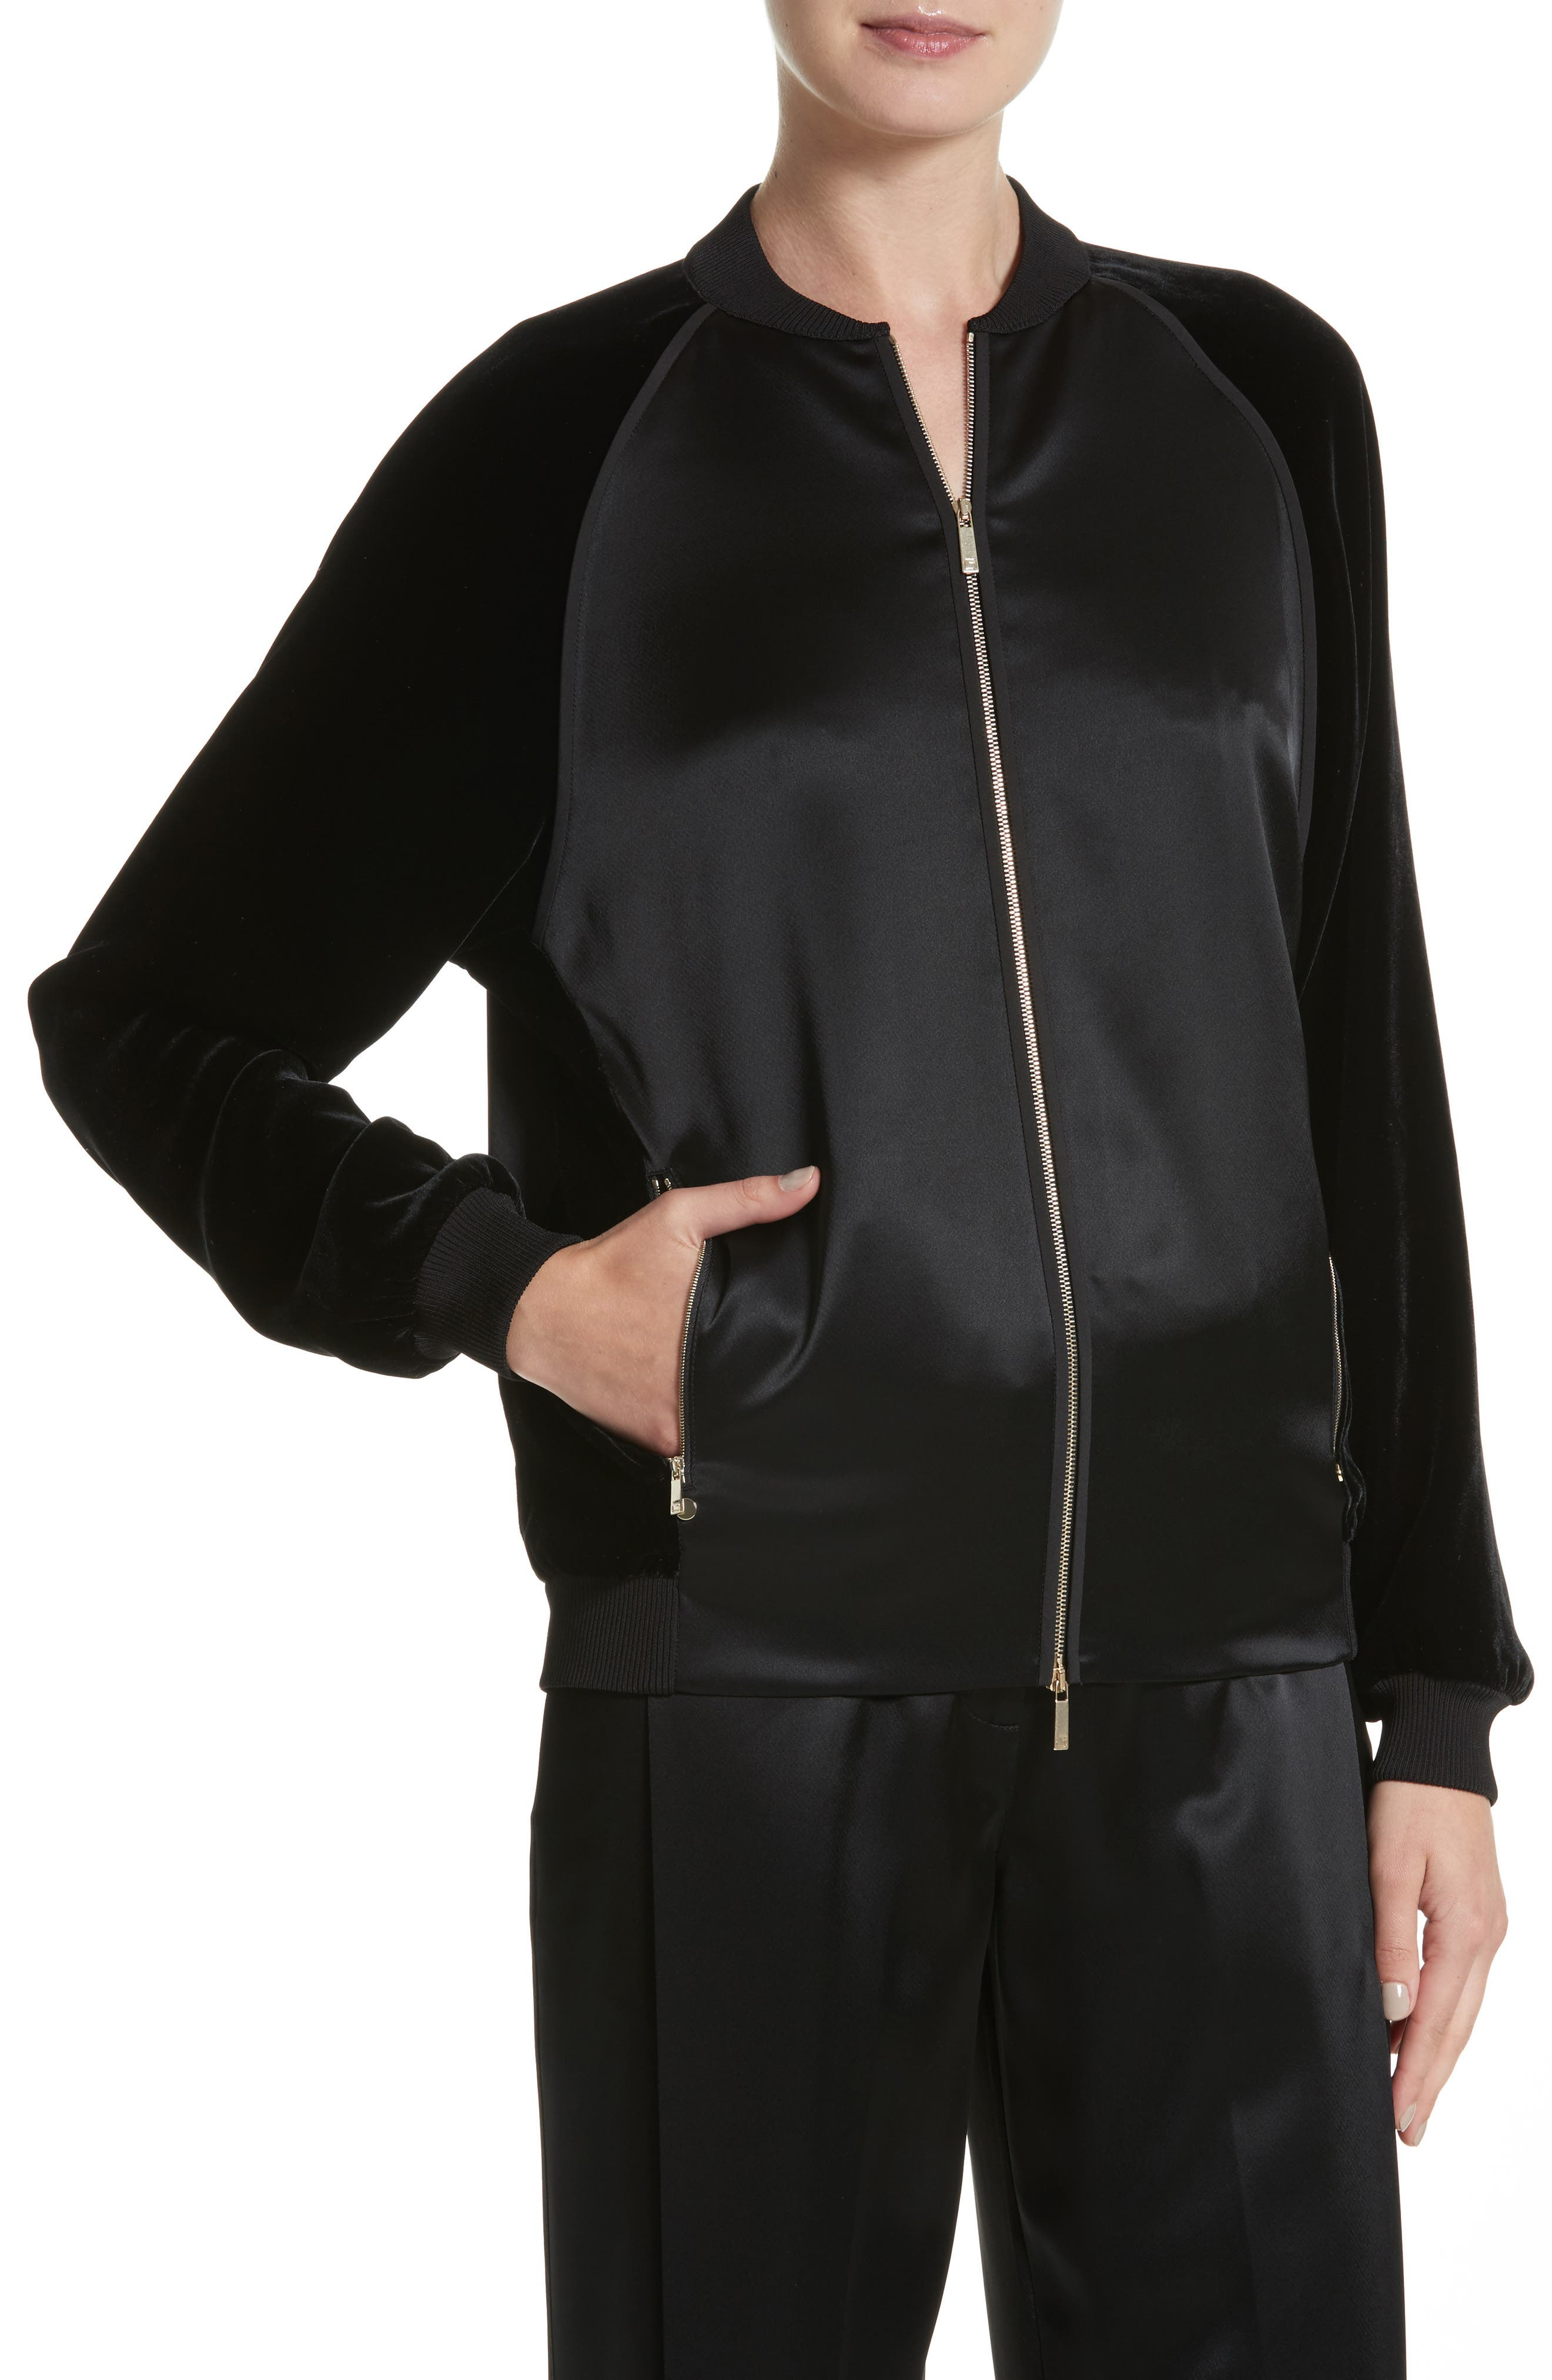 Brea Reverie Satin Cloth Bomber Jacket,                             Alternate thumbnail 4, color,                             001